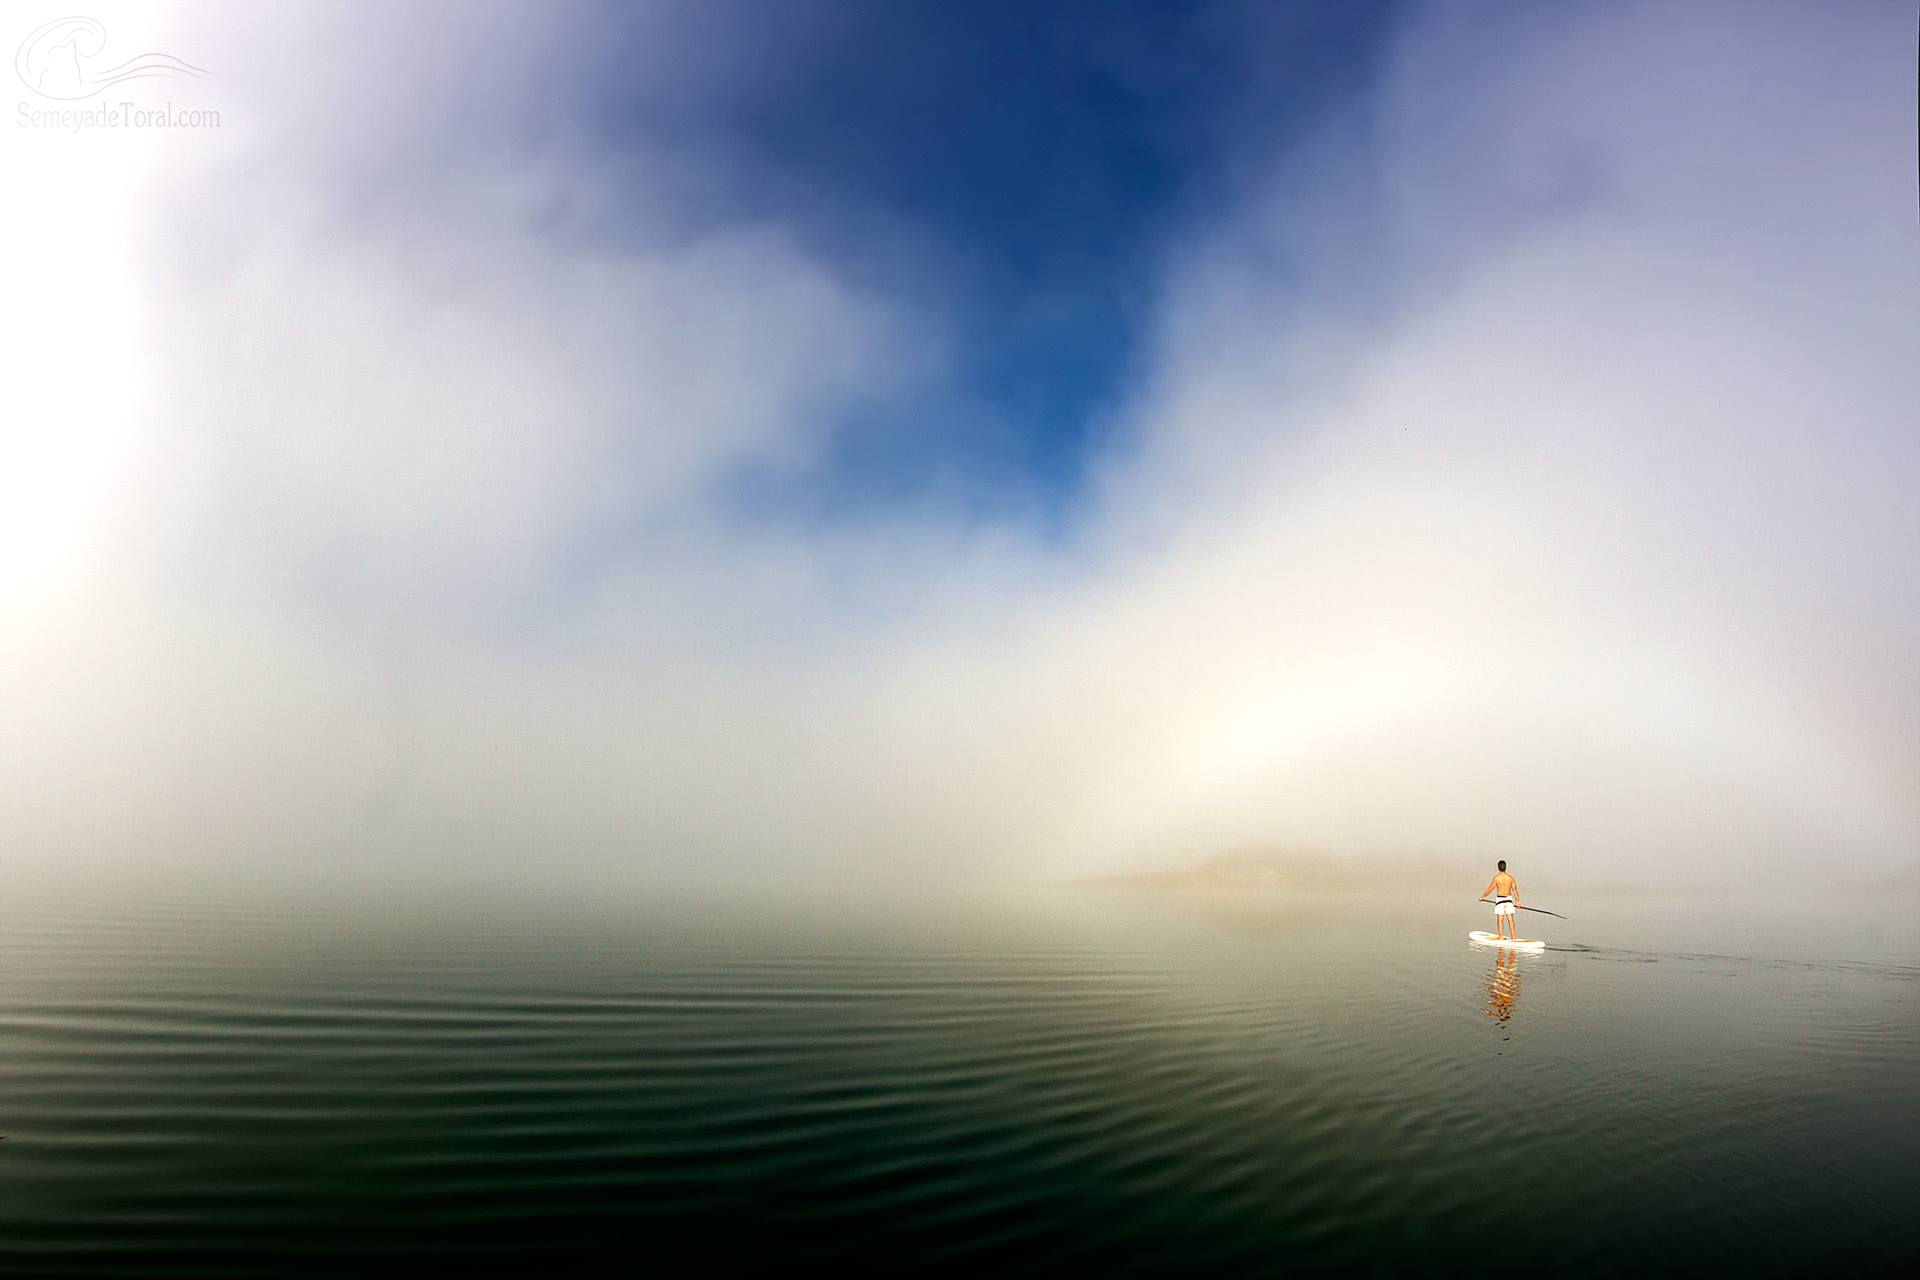 A solas con uno mismo. - STAND UP PADDLE SURF - Semeya  de Toral